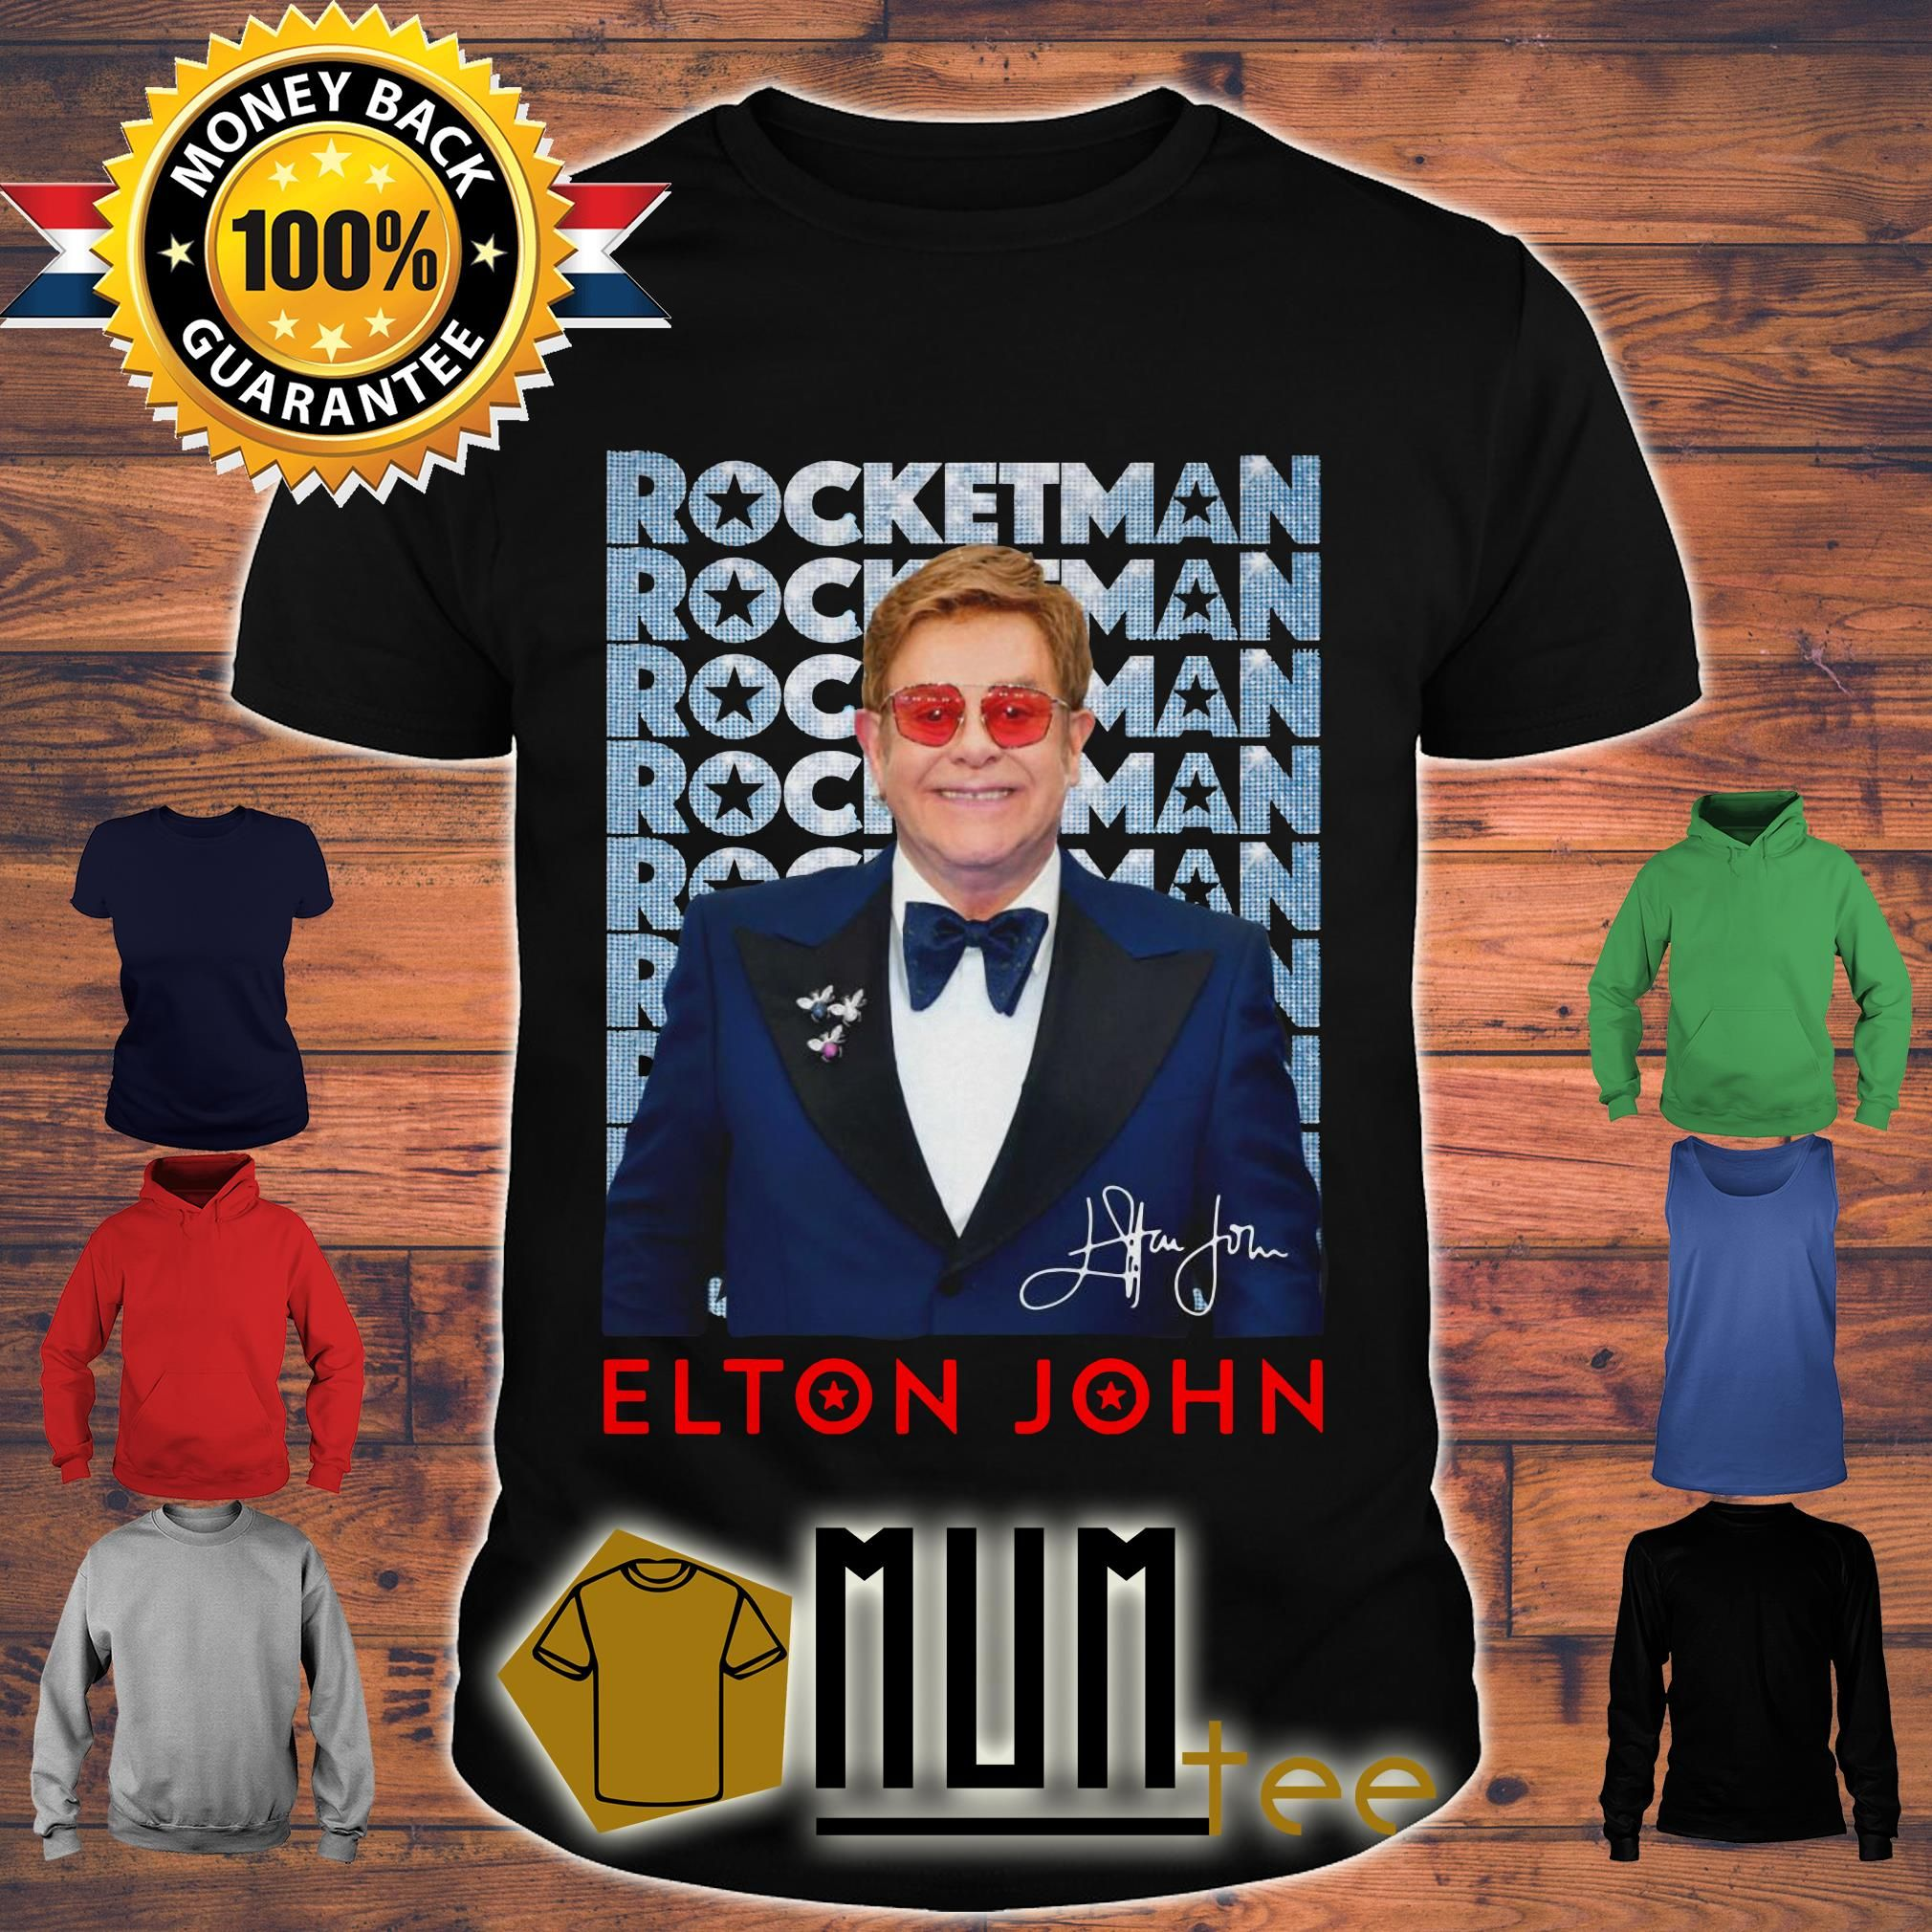 (Fast Shipping) Rocket Man Elton John shirt, tank top, v